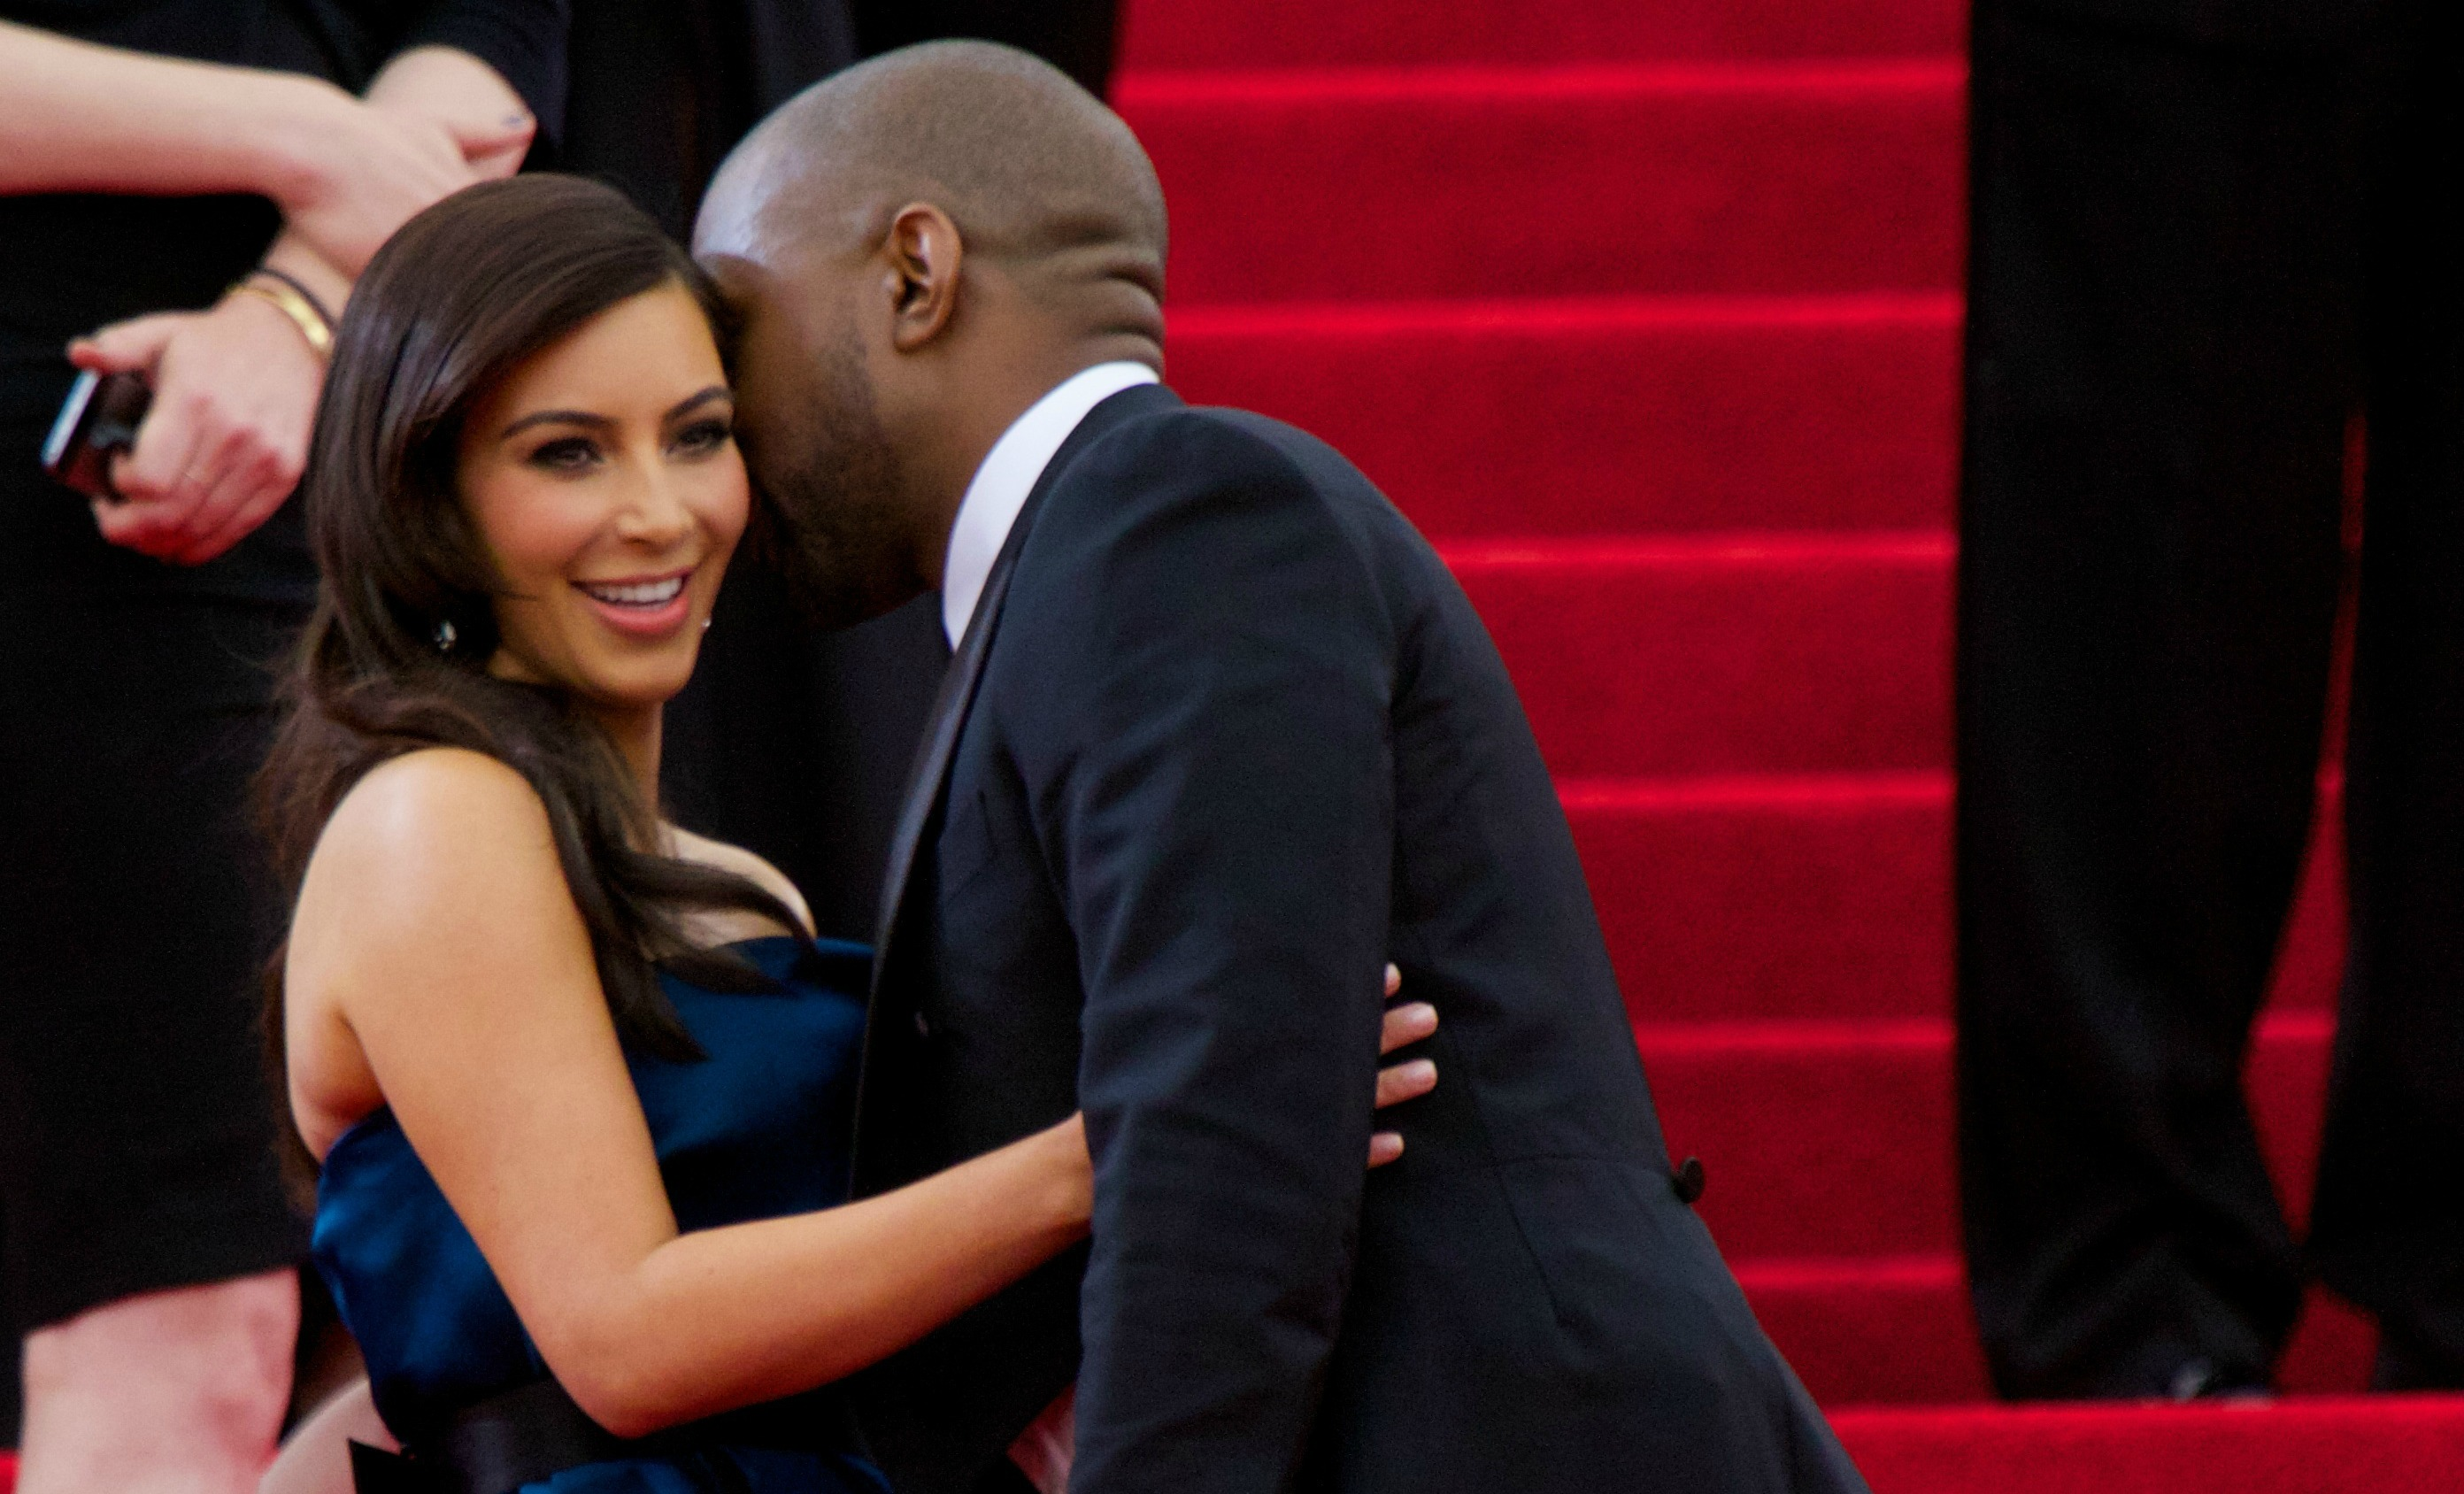 Kim Kardashian flashes underwear en route to Met Gala